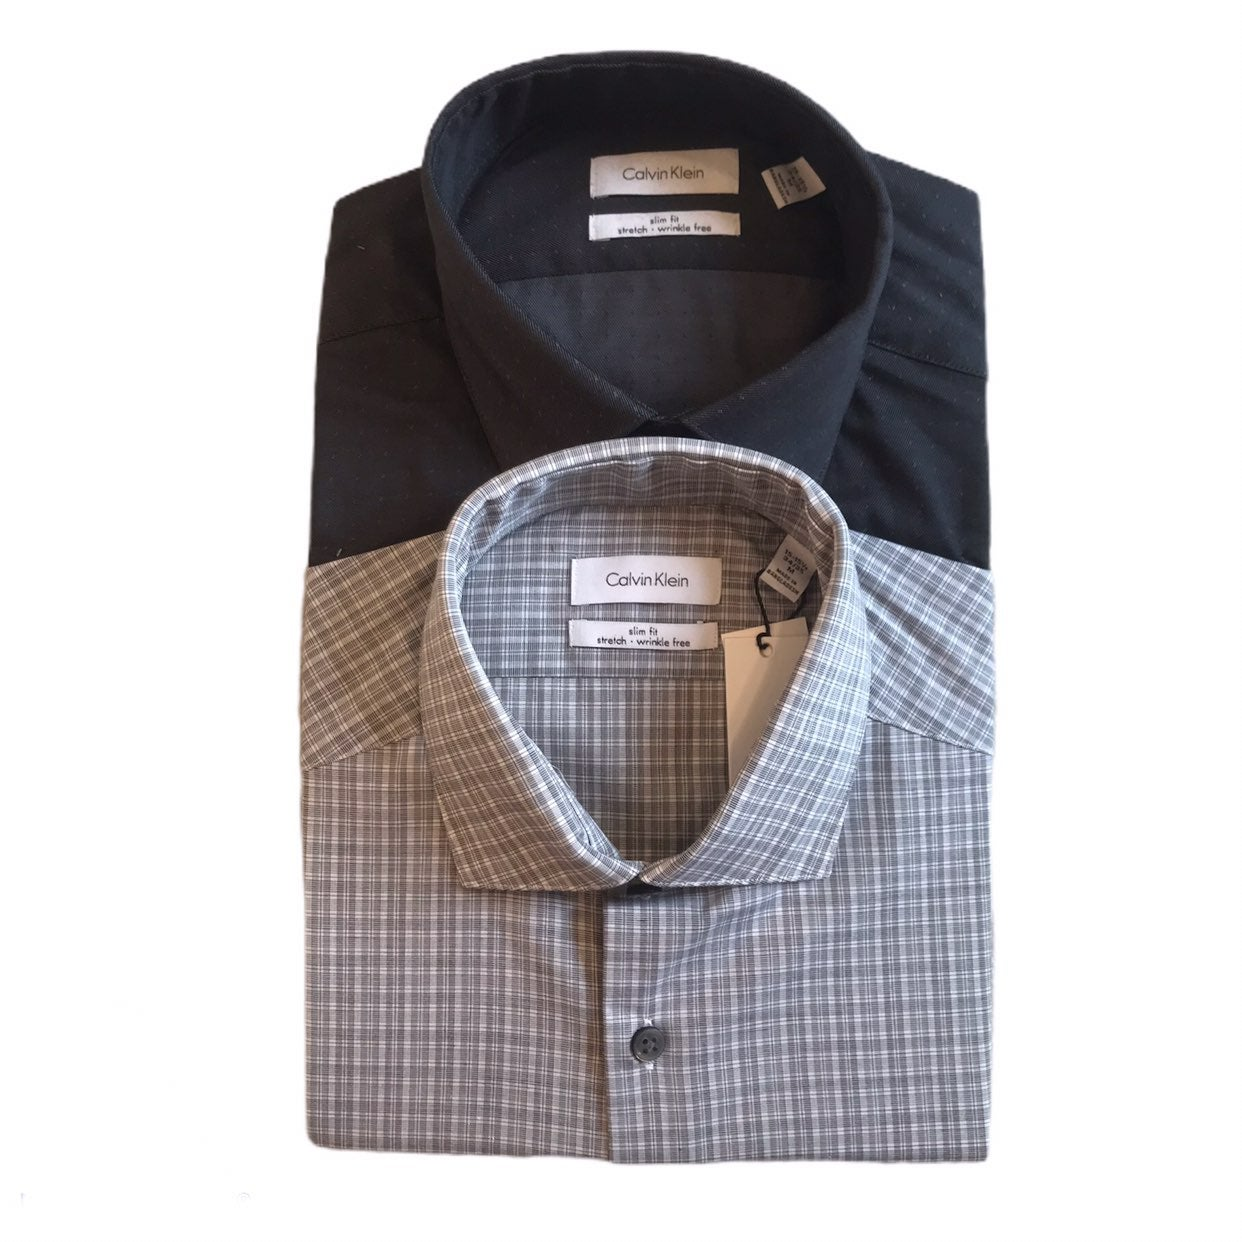 Calvin Klein Slim Fit 2 Pack Dress Shirt